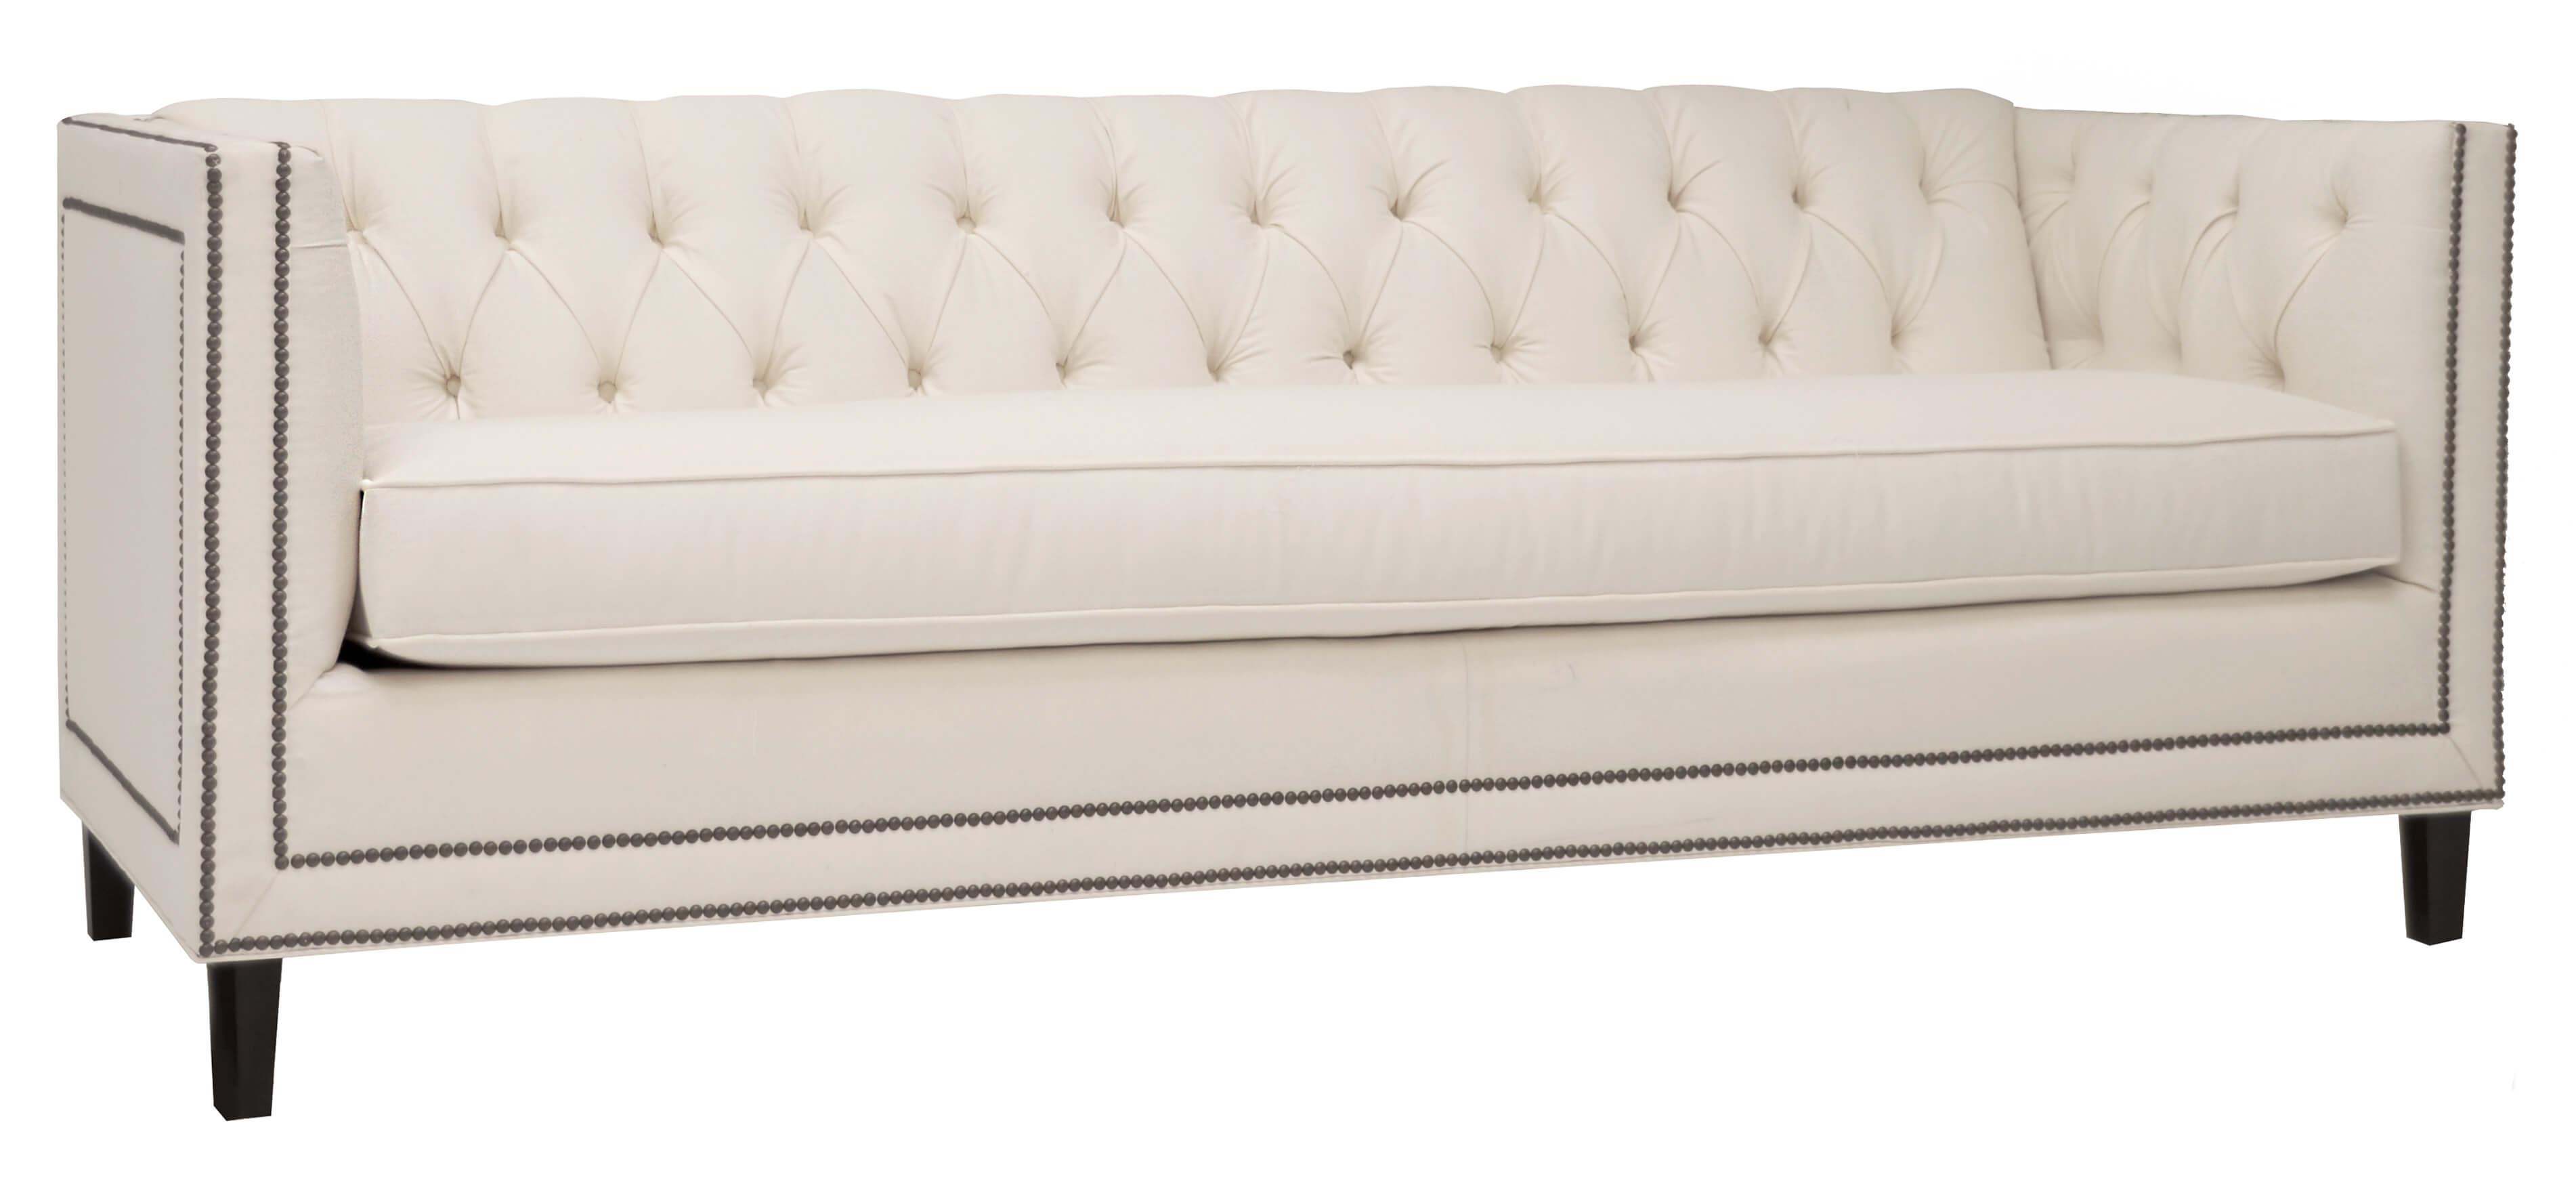 Kaden 1237-80 Sofa_New Classic